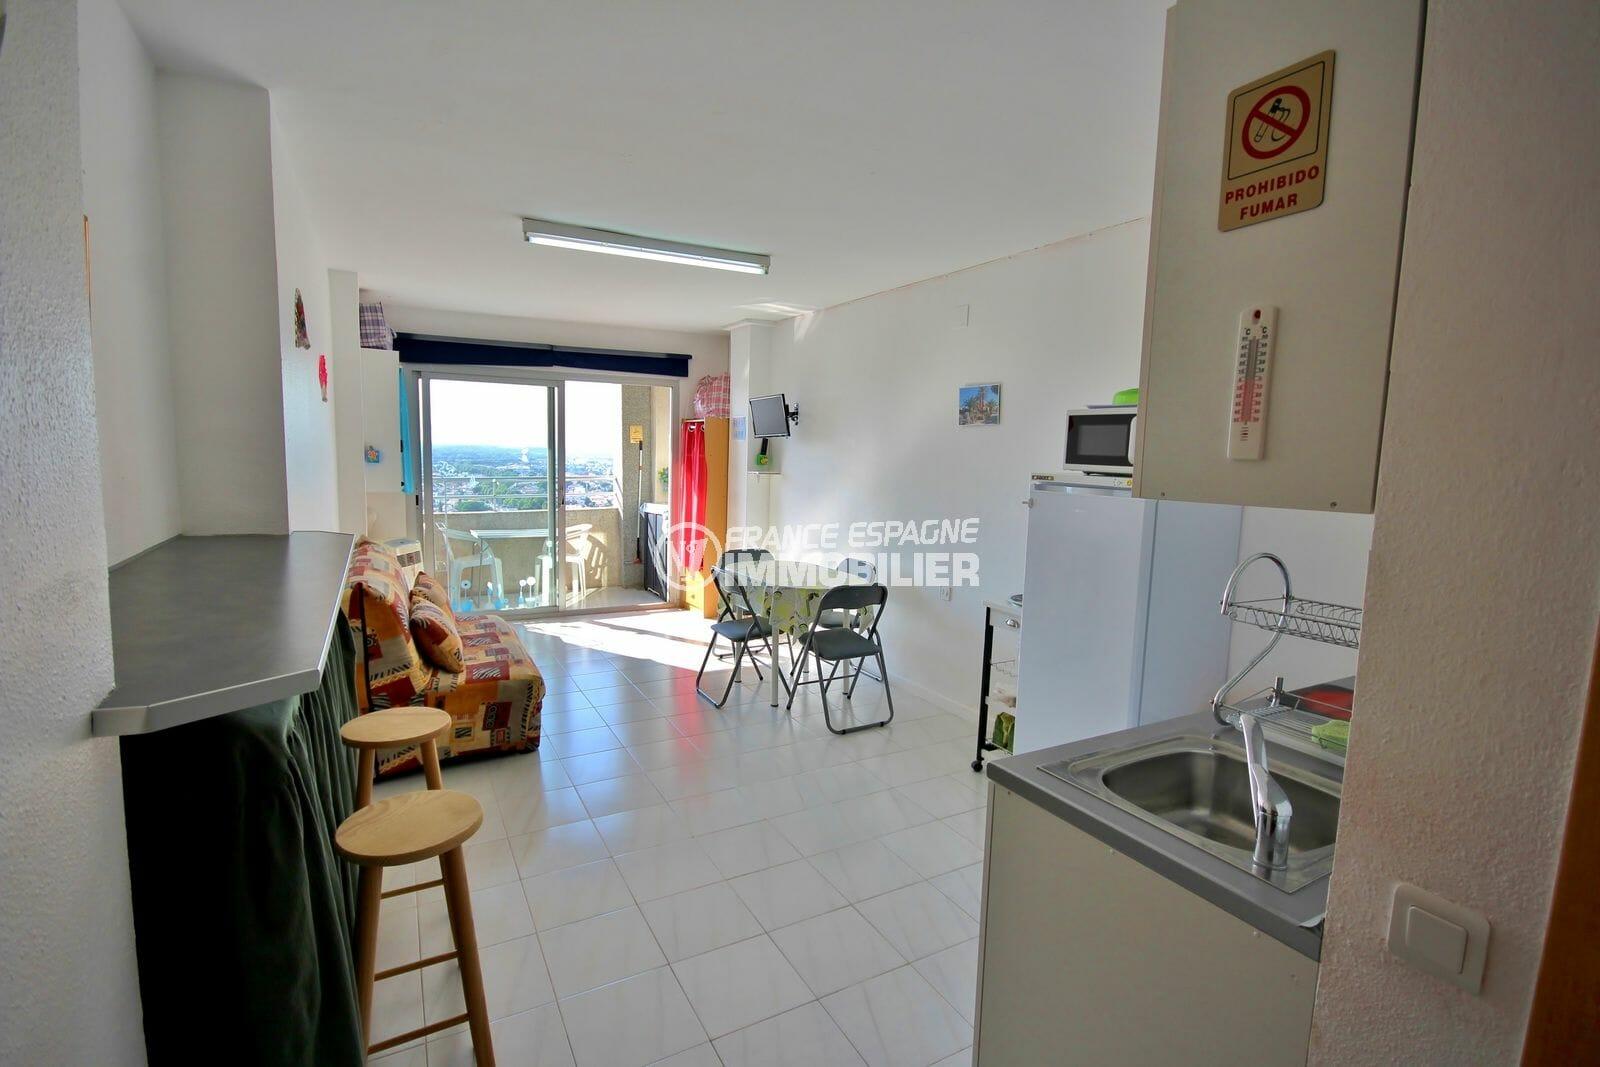 agence immobilière costa brava: studio 24 m², aperçu de la pièce principale accès terrasse